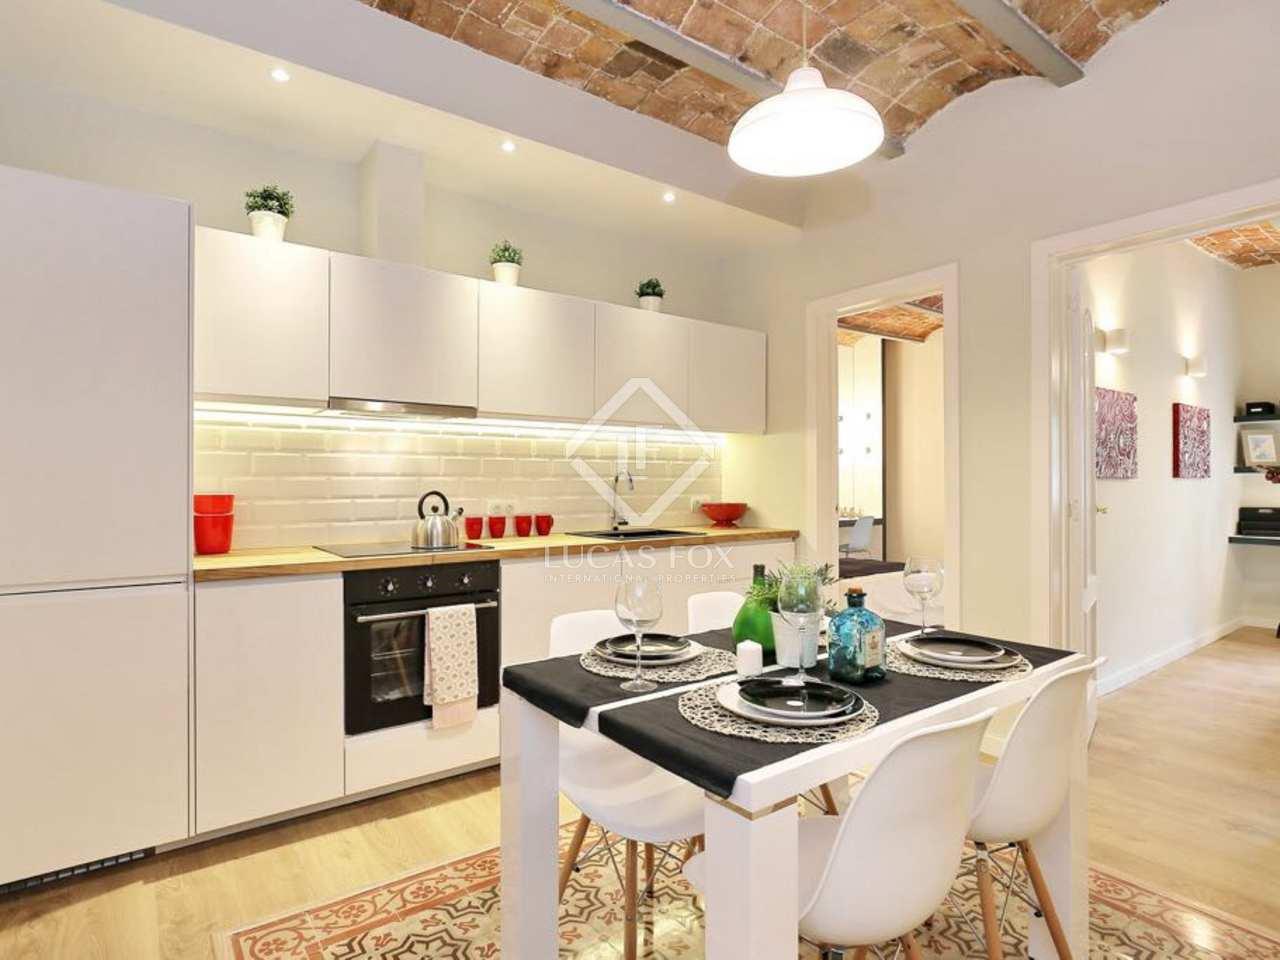 77 M Apartment For Sale In Poble Sec Barcelona # Muebles Poble Sec